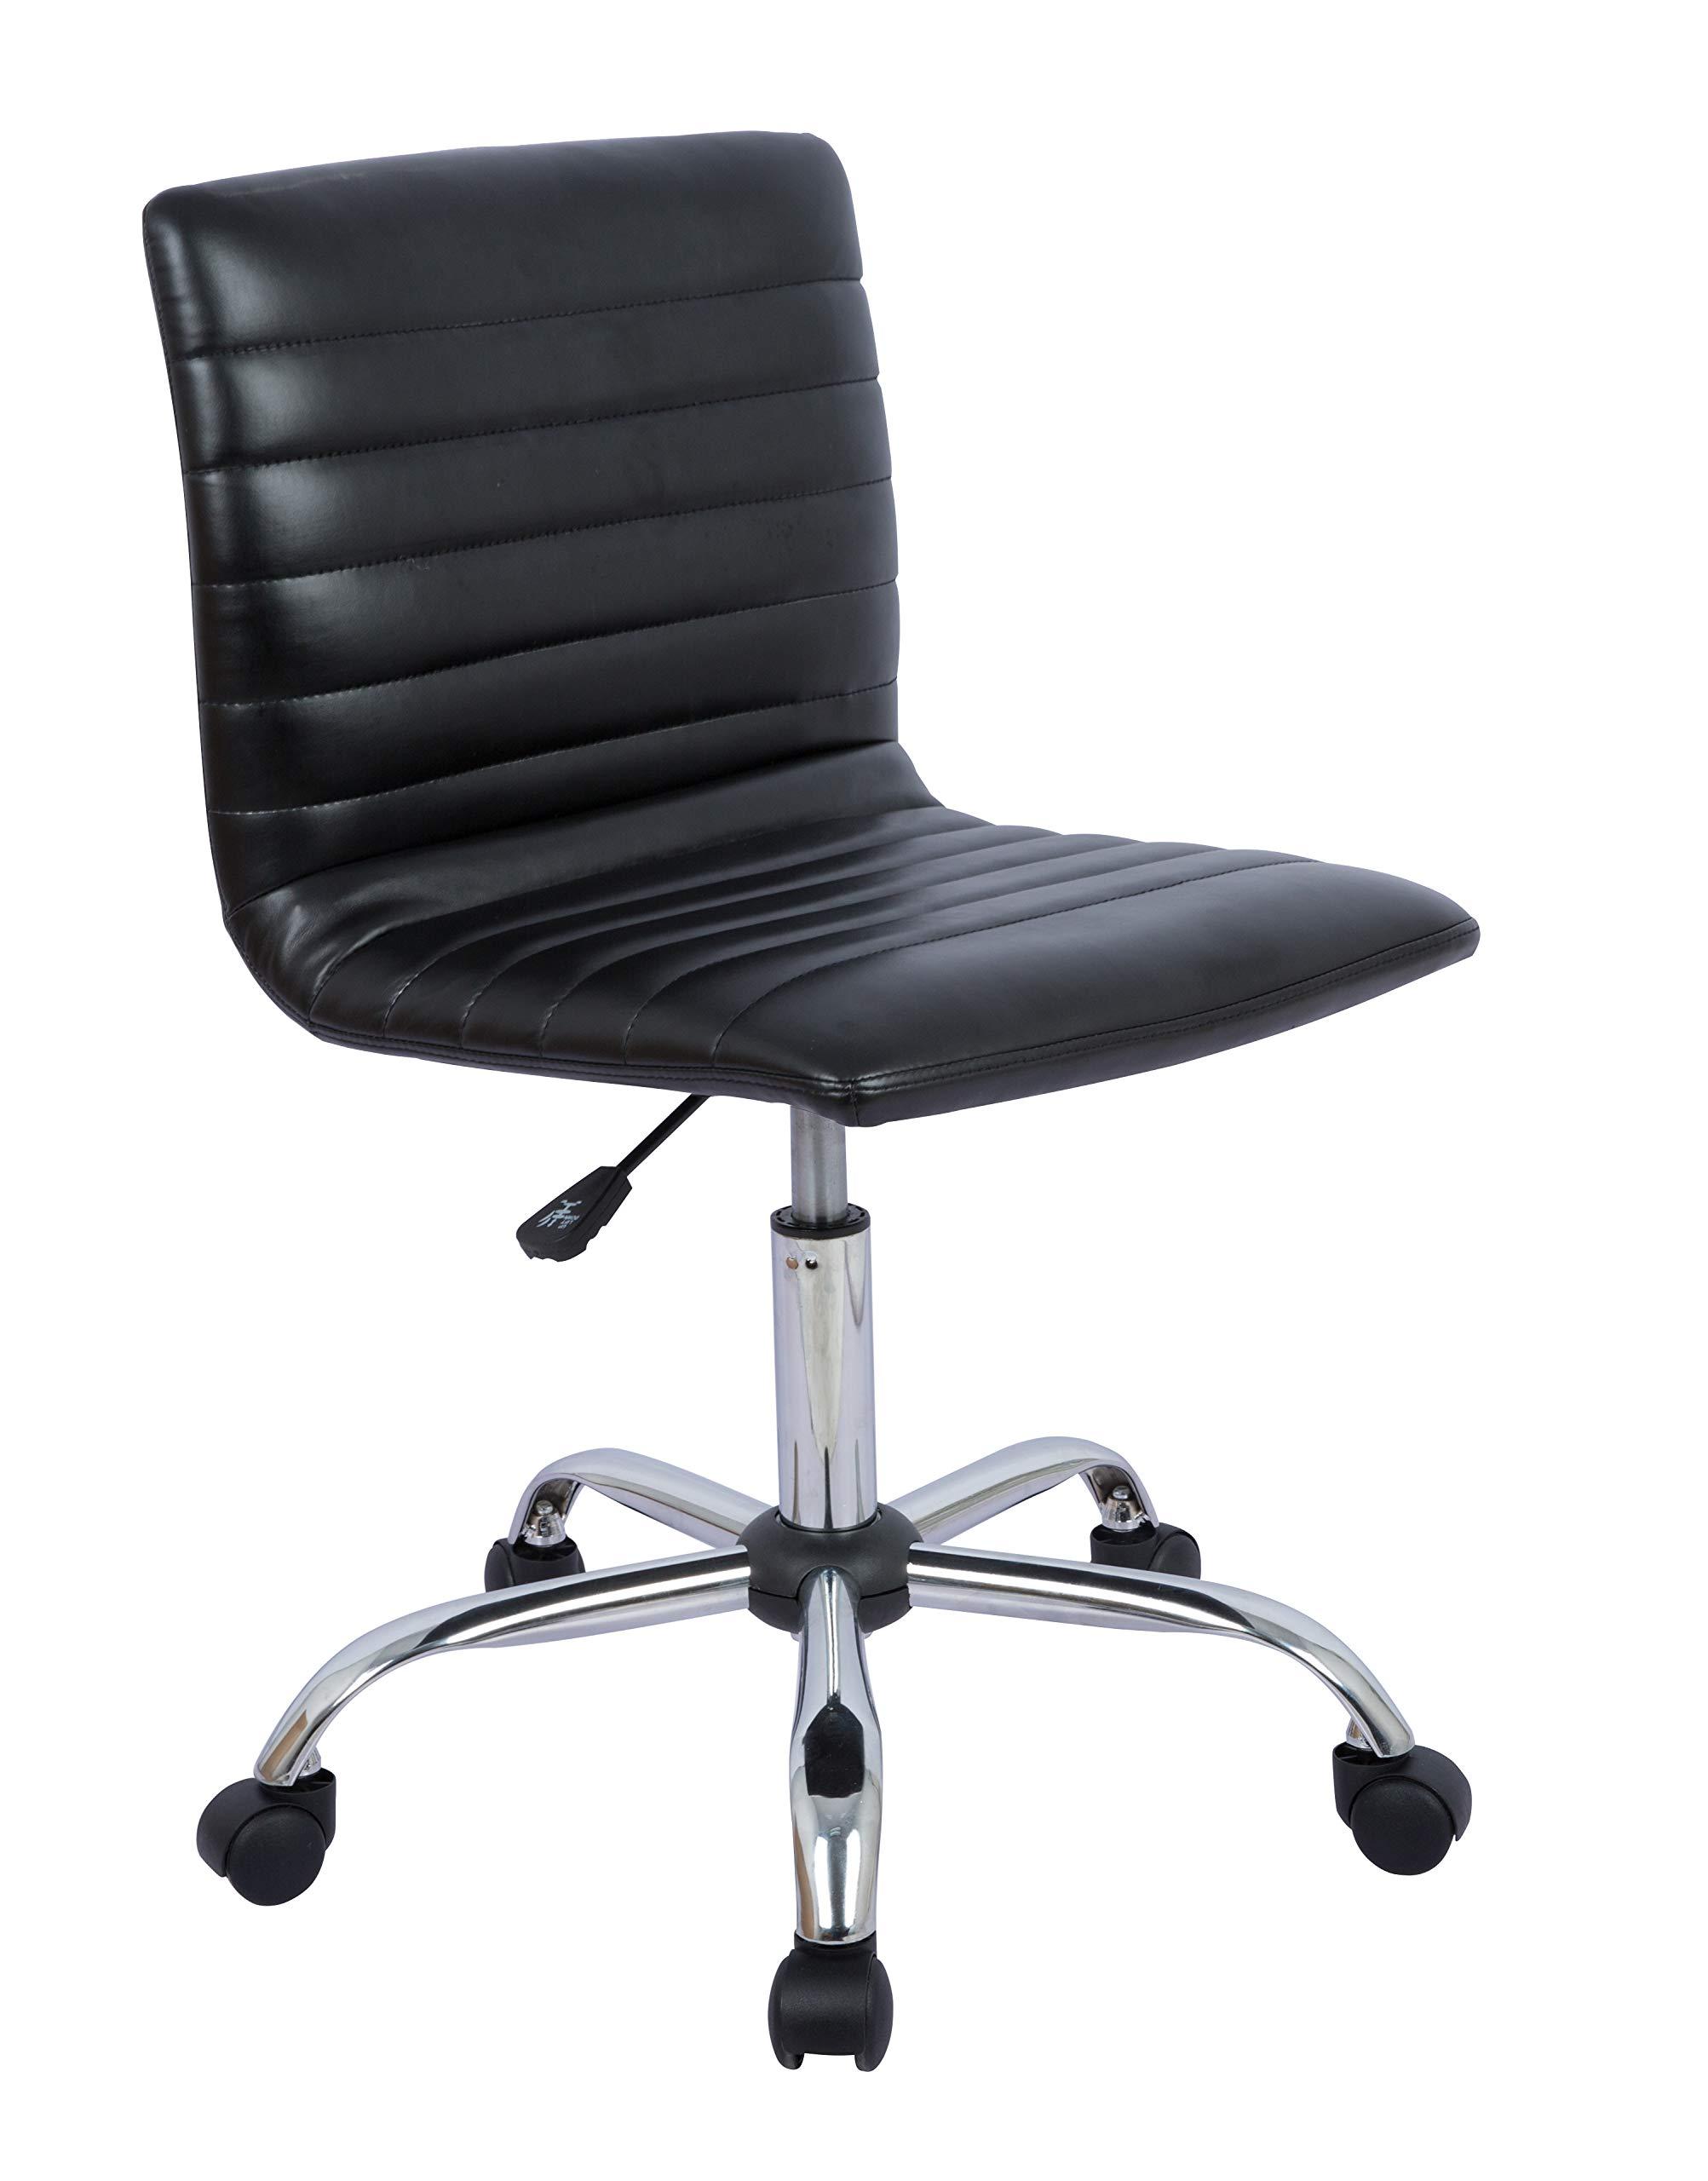 AmazonBasics Modern Adjustable Low Back Armless Ribbed Task Chair, Black by AmazonBasics